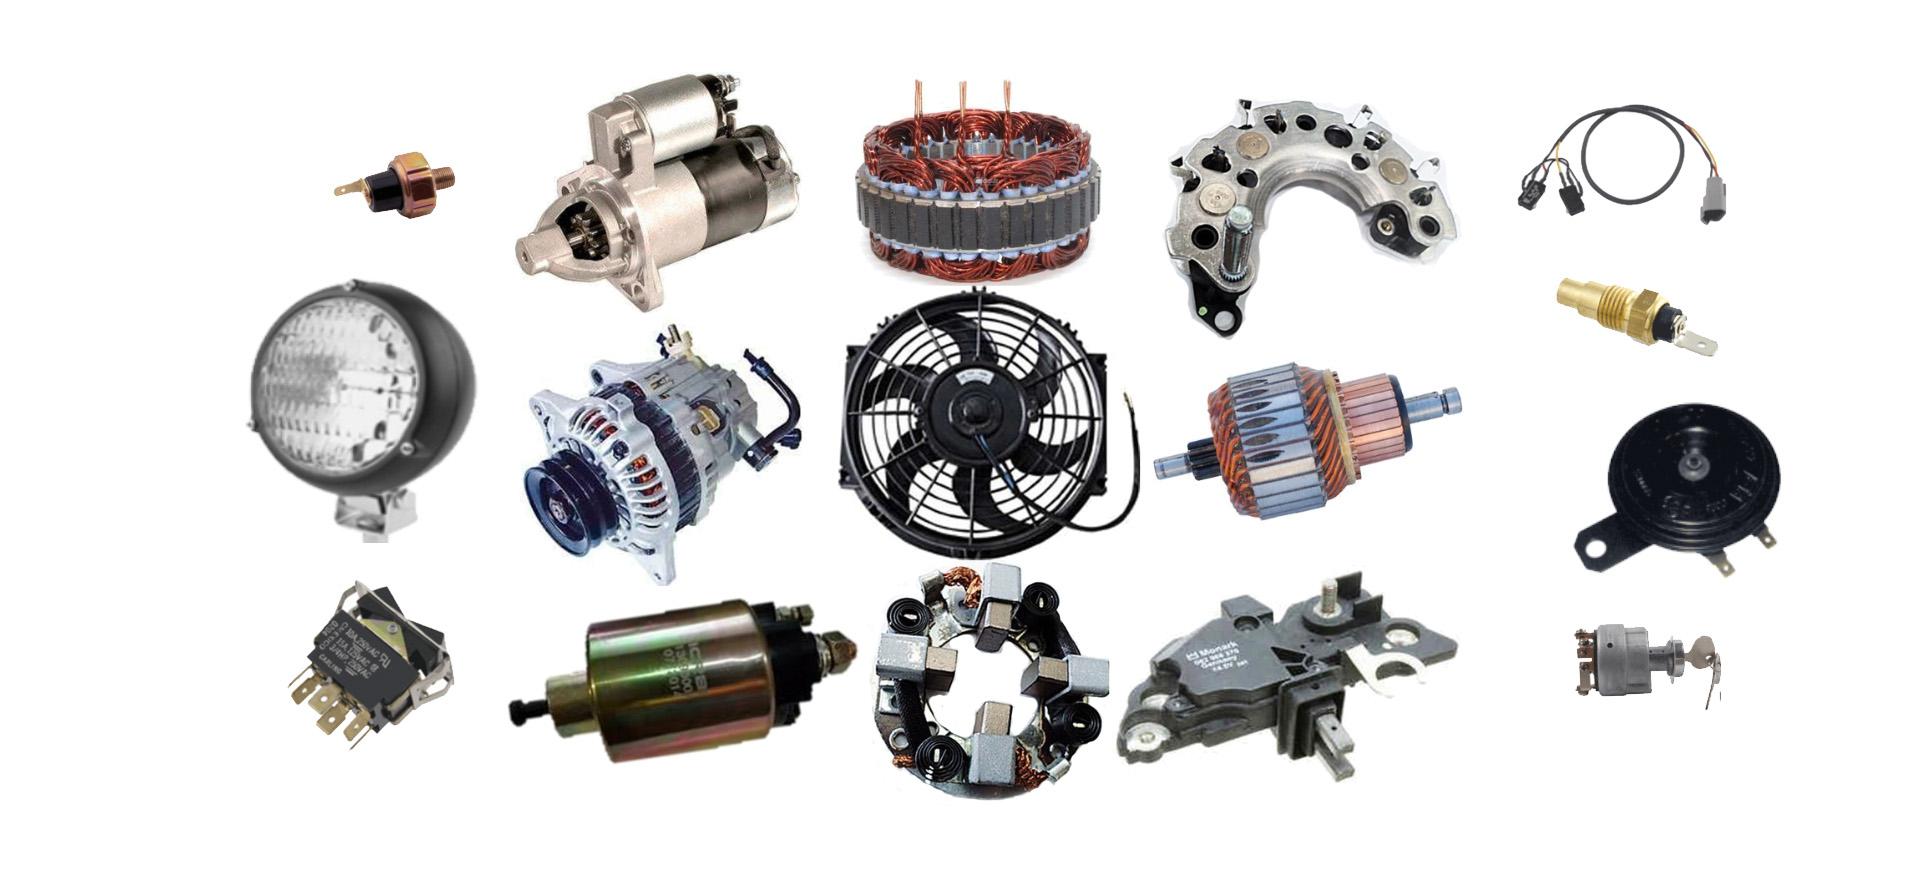 Ford Focus Wiring Diagram Pdf Auto Electrical Pacar W900 Fuse 2001 Search Results For U201cpartes De Un Alternador Autos